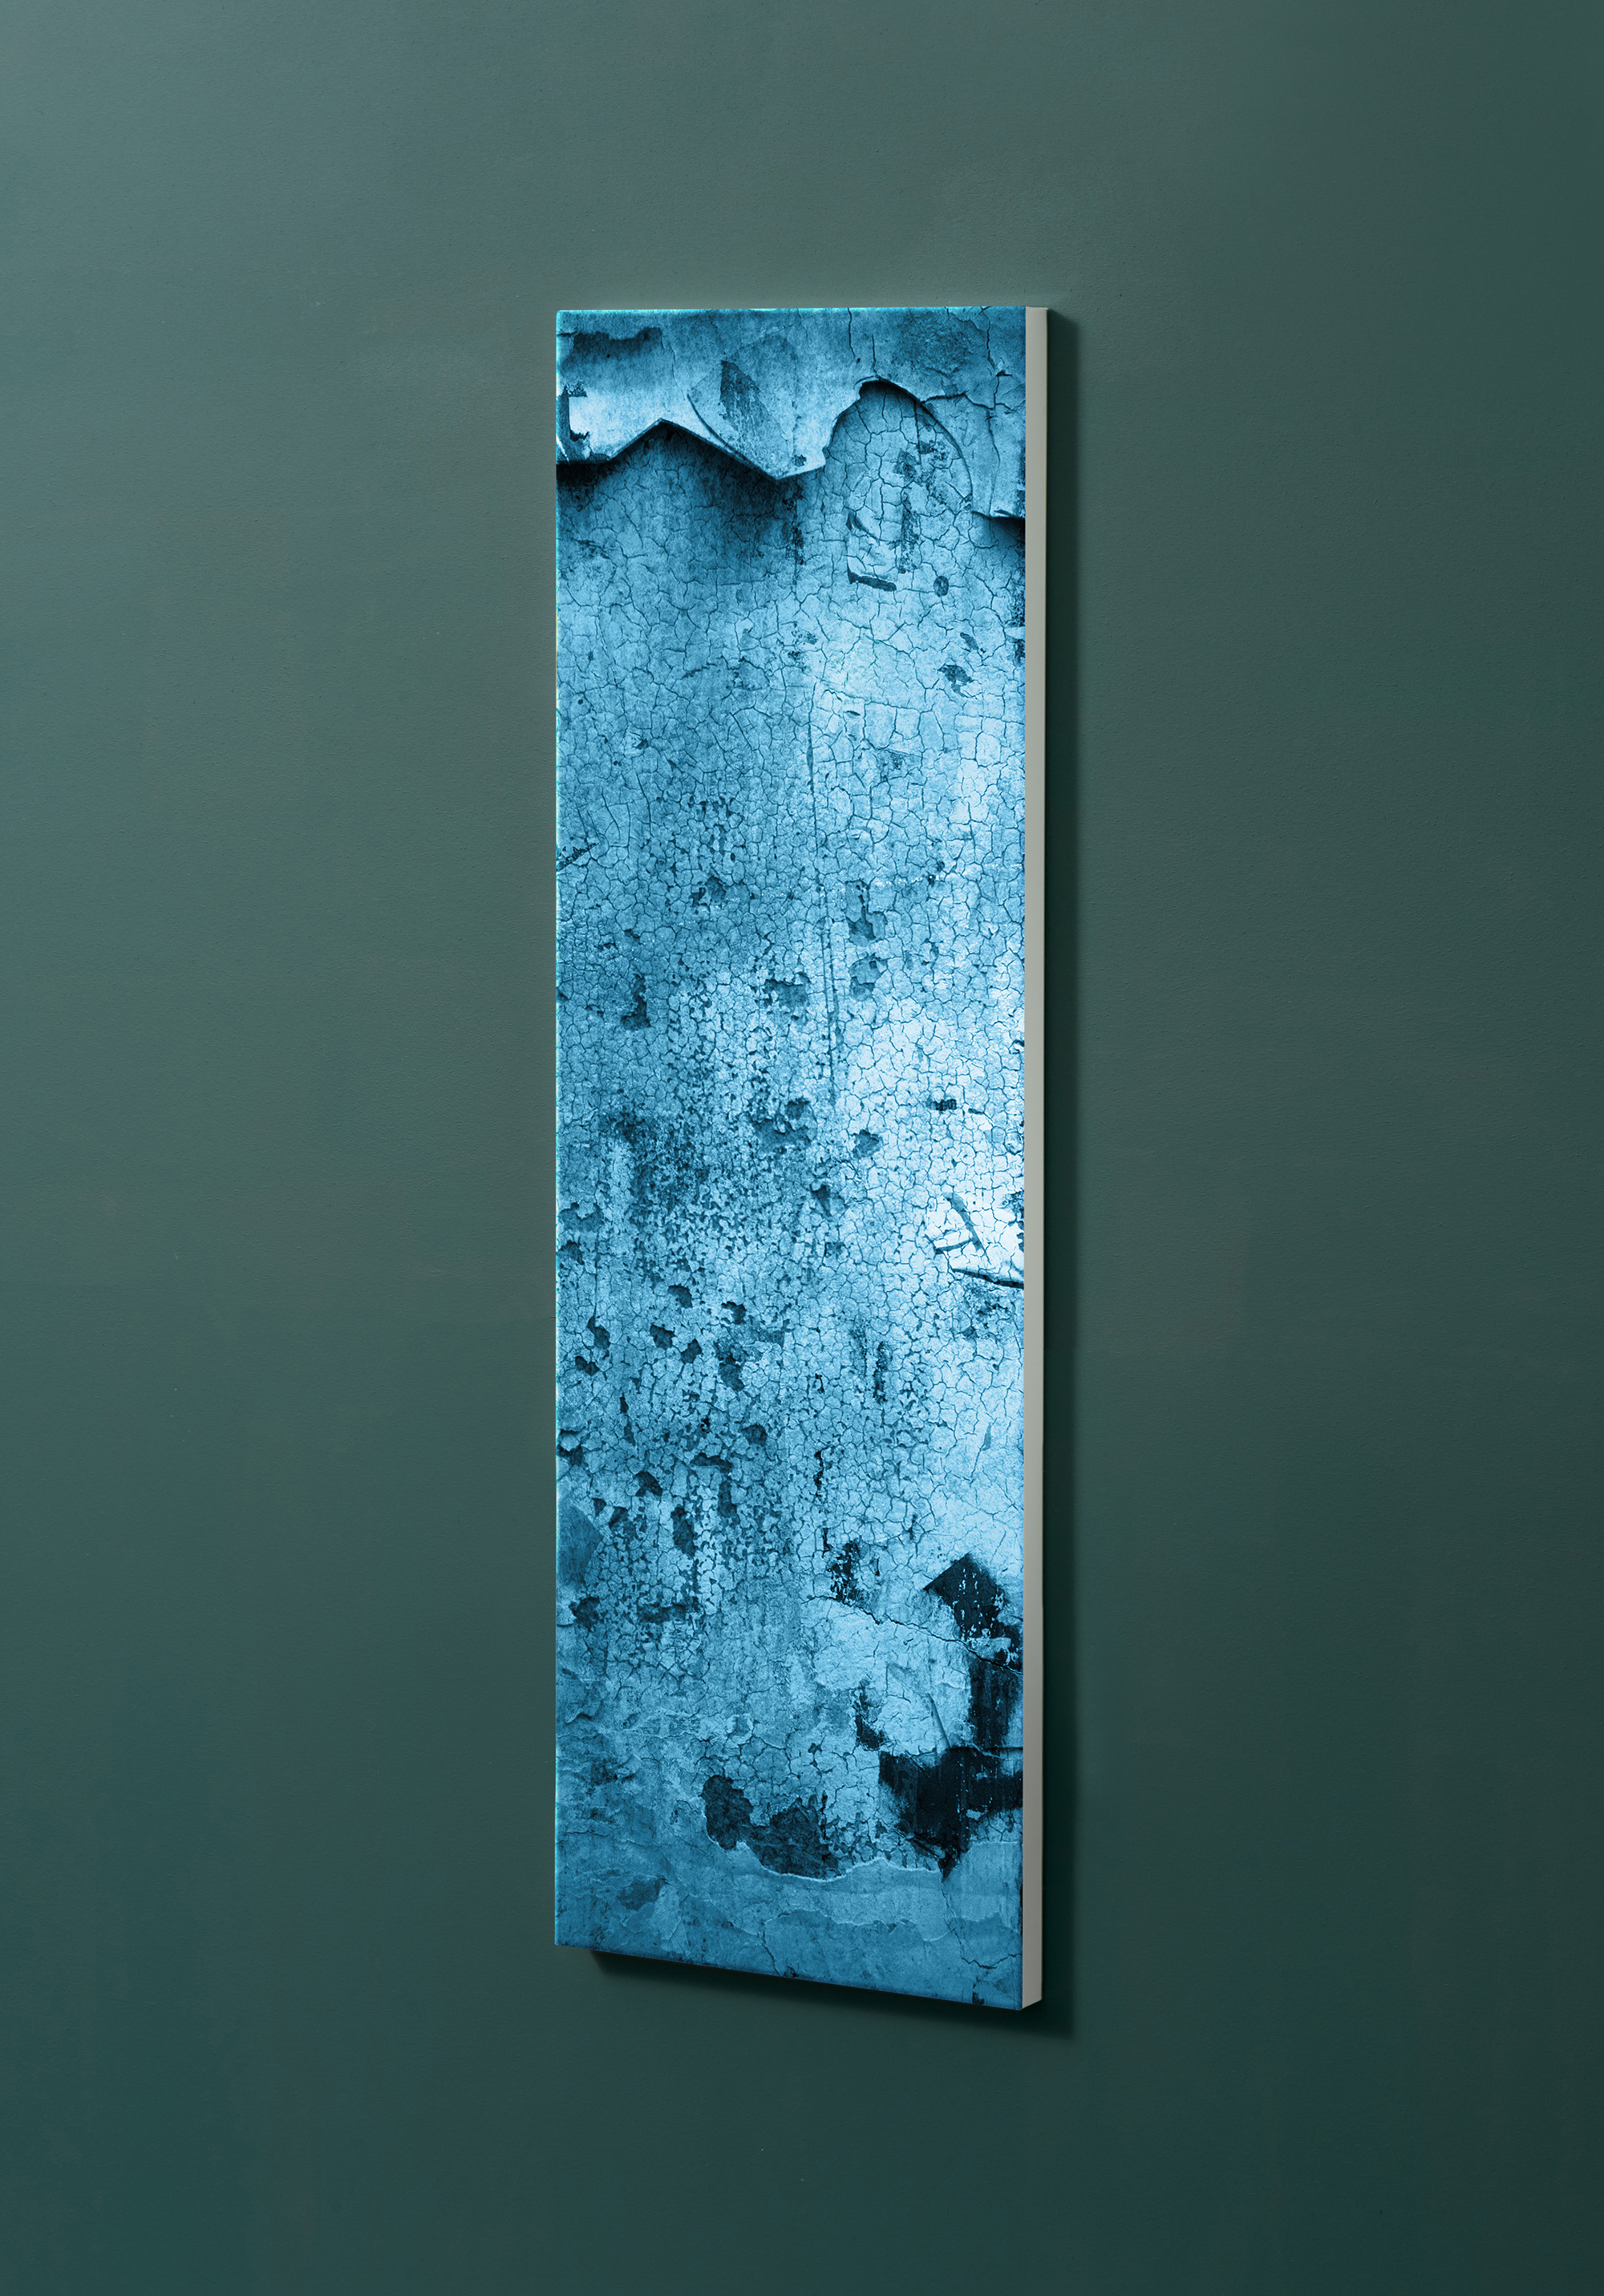 Magnettafel NOTIZ 30x90cm Motiv-Pinnwand M41 Beton